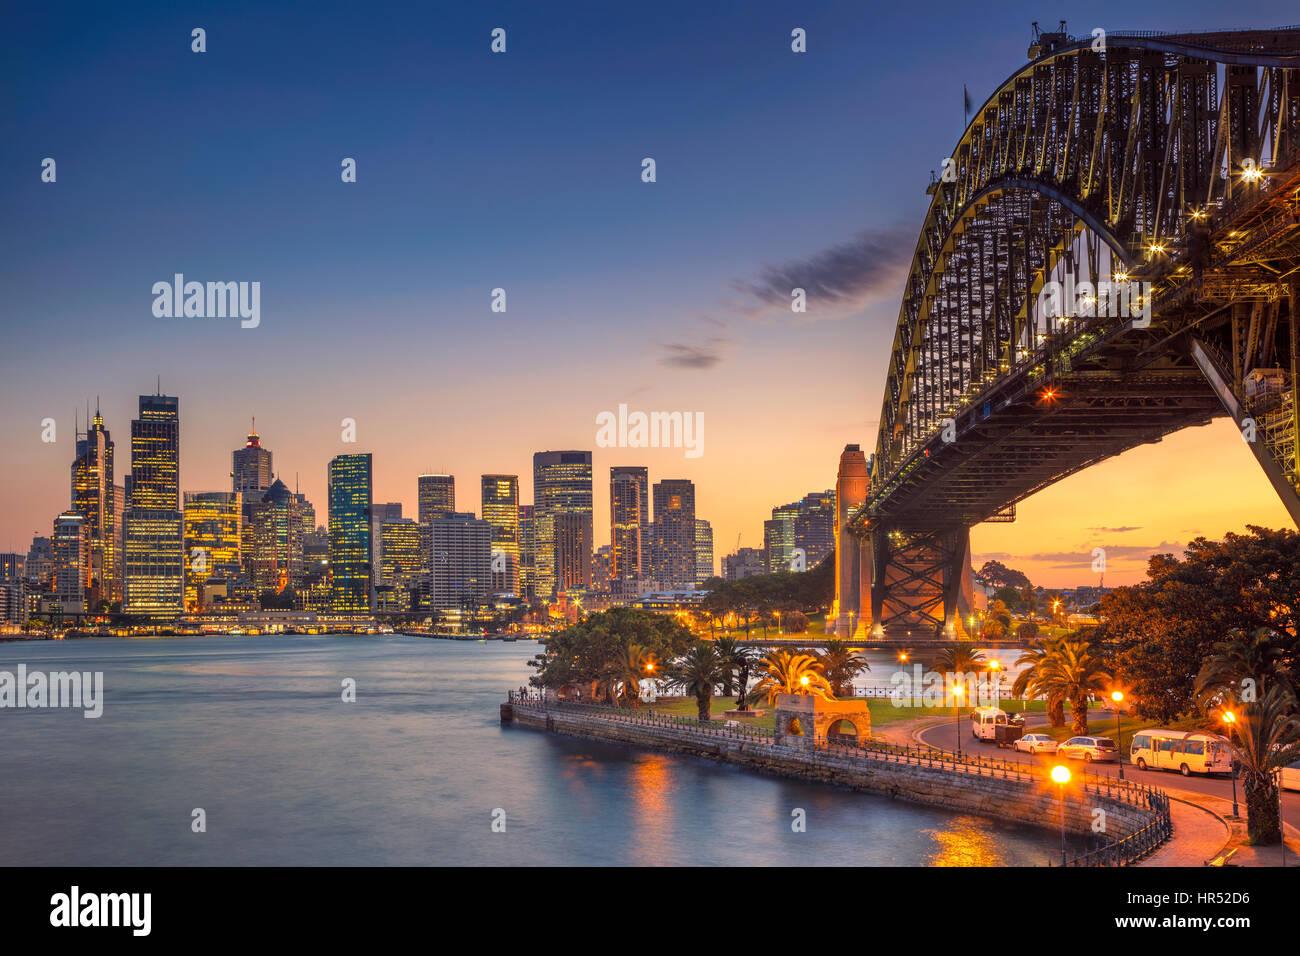 Sydney. Cityscape image of Sydney, Australia with Harbour Bridge during summer sunset. - Stock Image